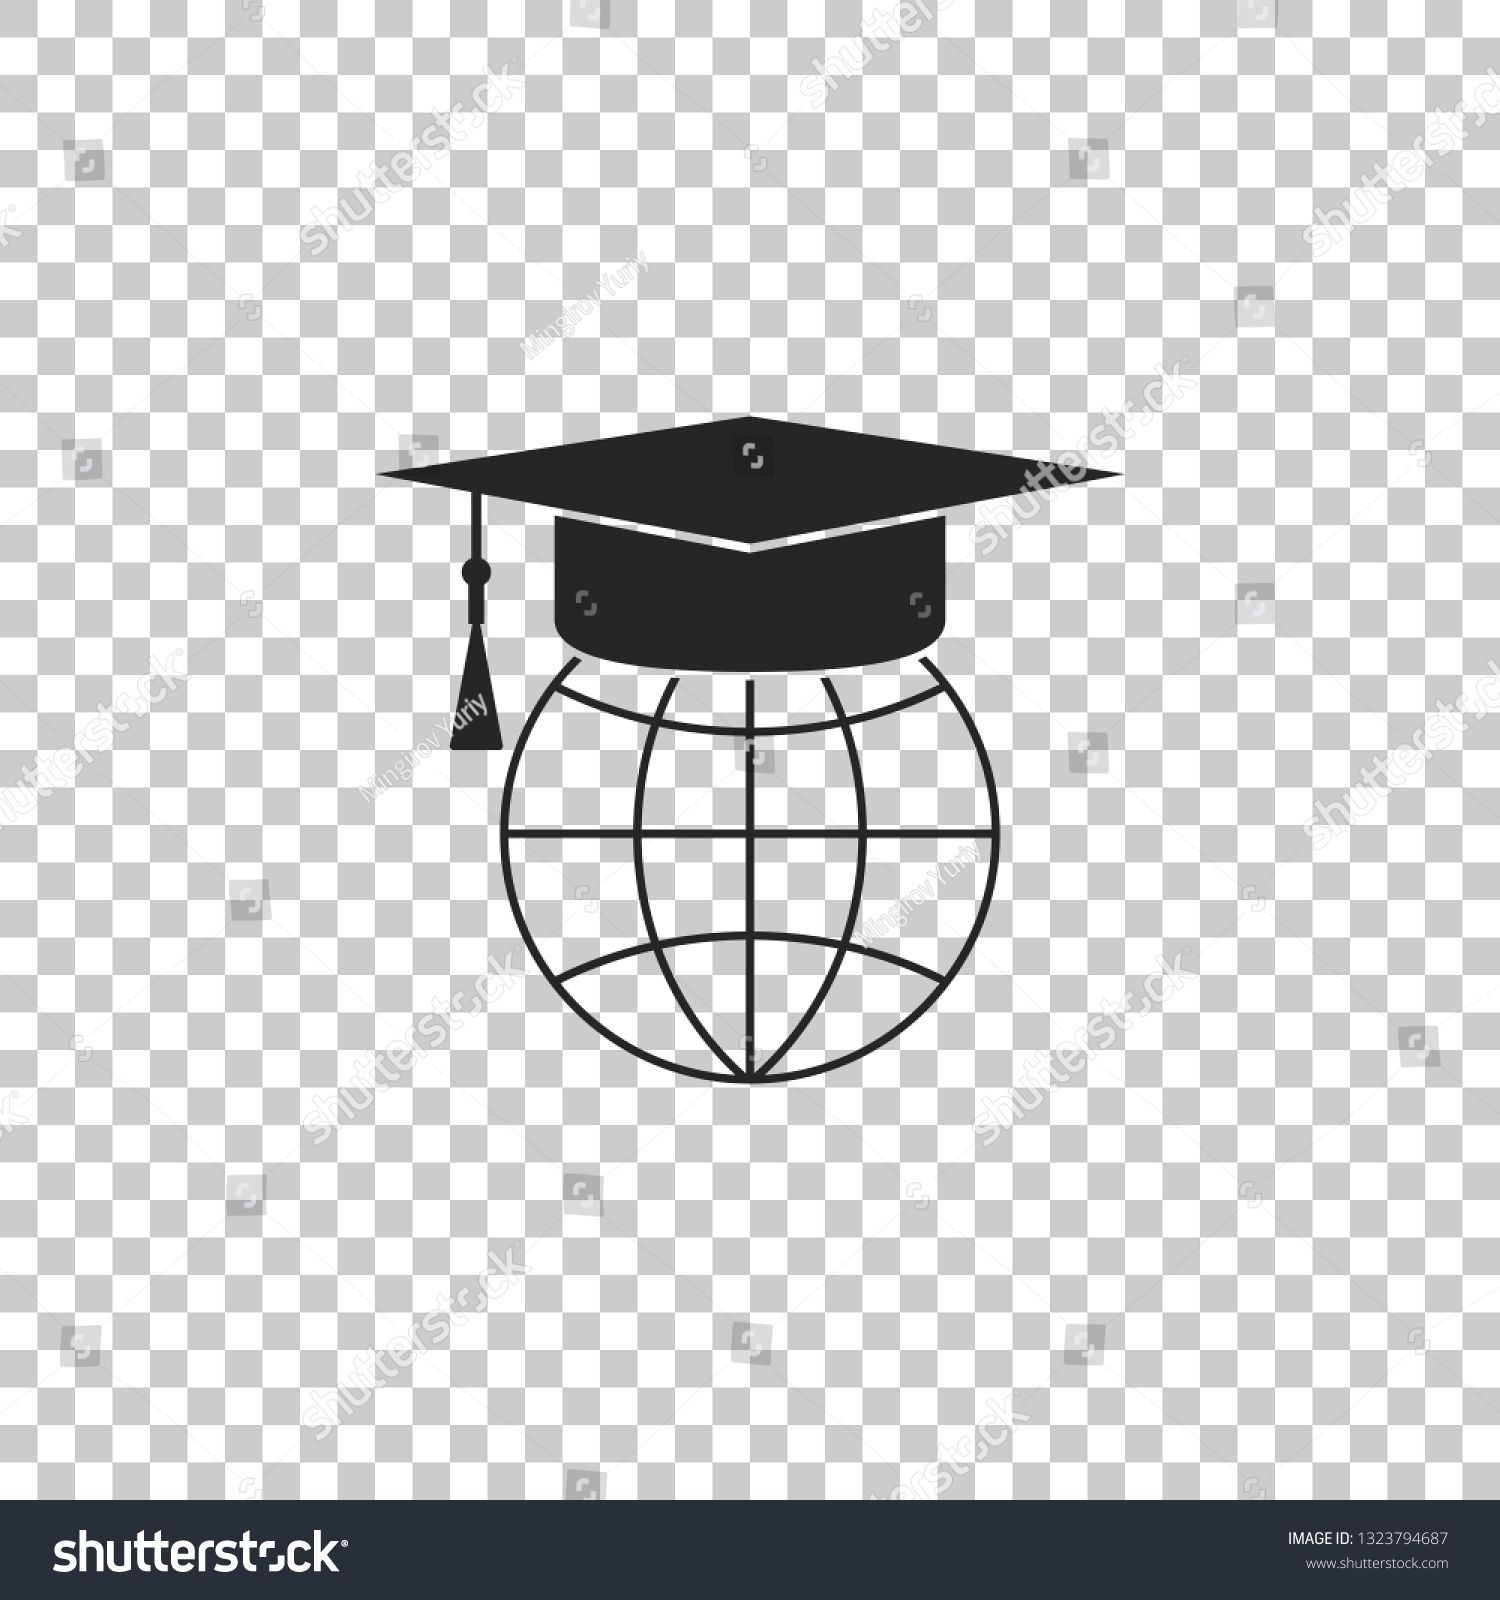 Graduation Cap On Globe Icon Isolated On Transparent Background